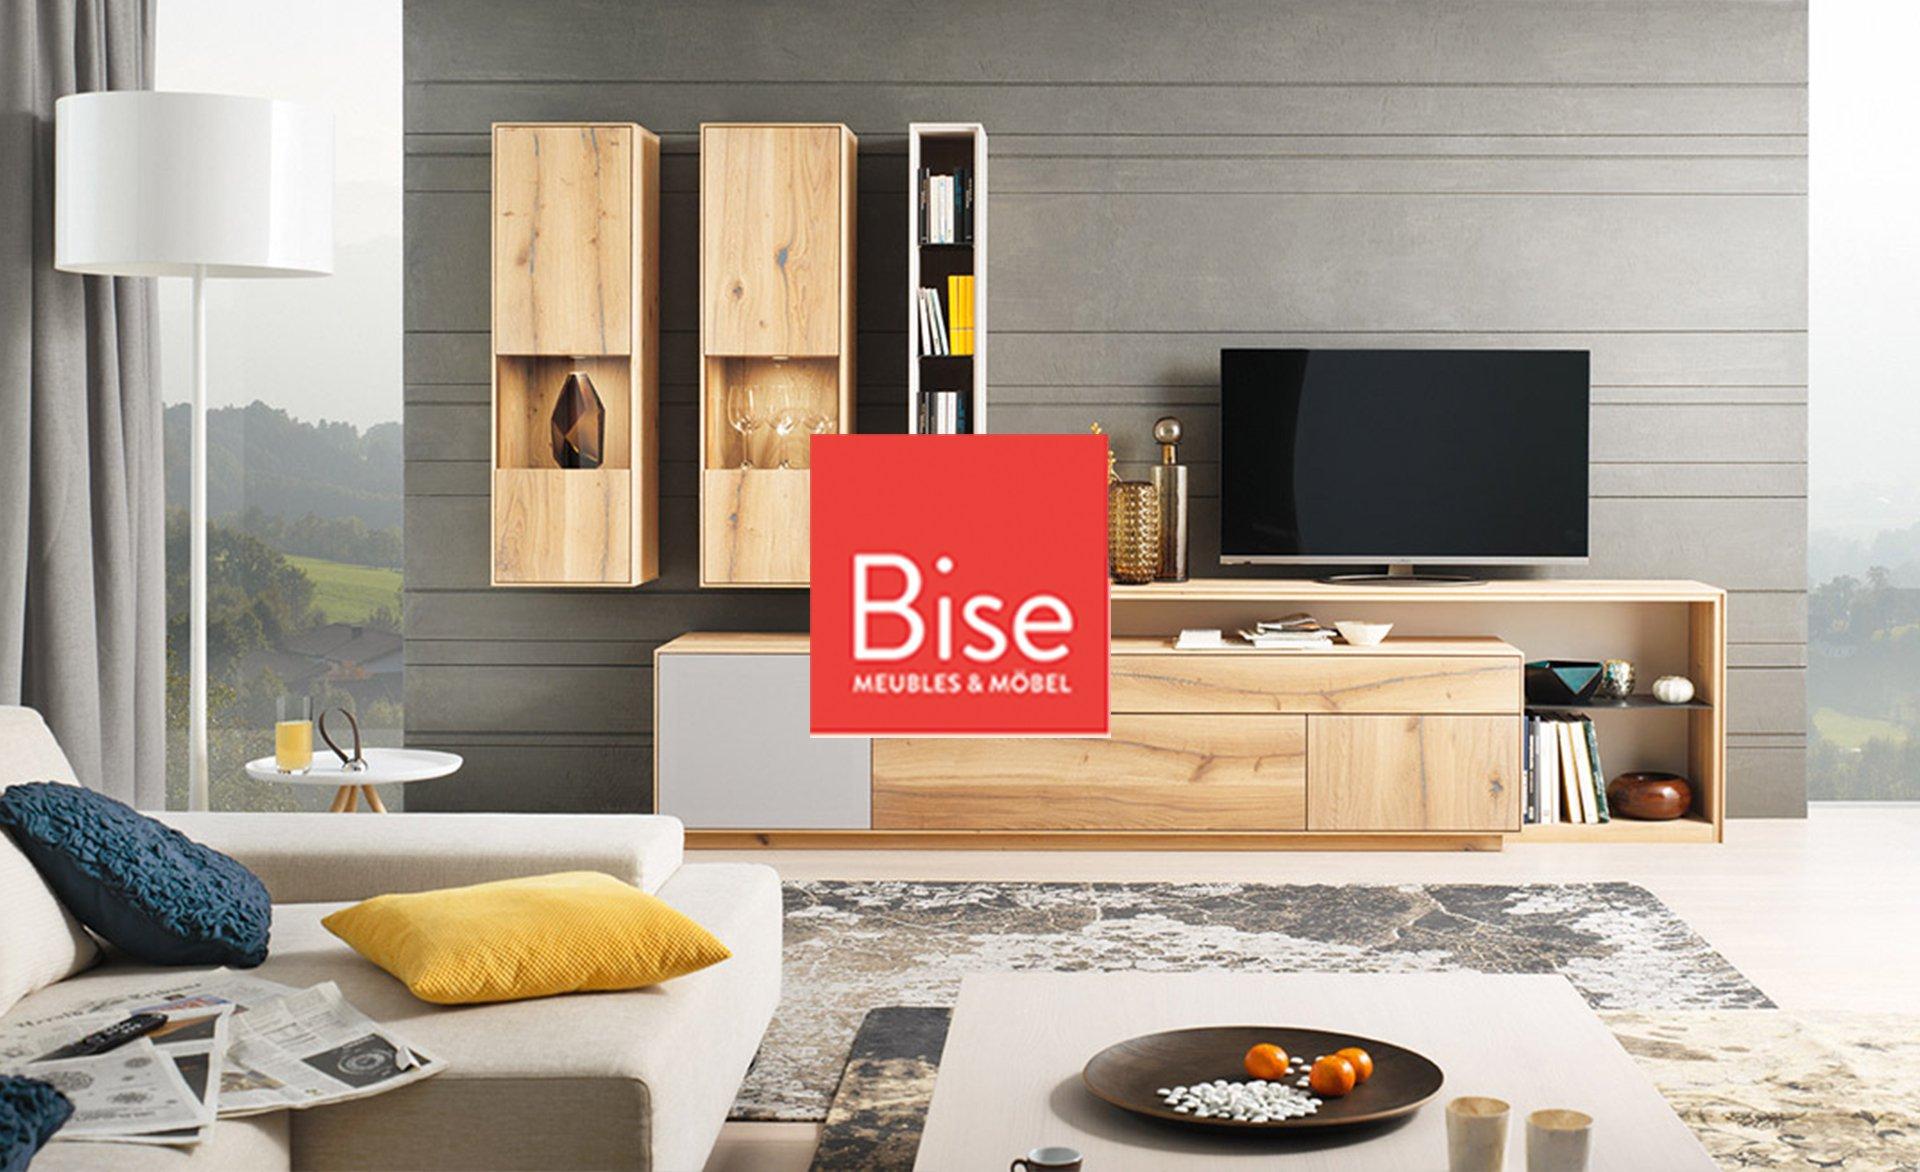 Meubles bise magasin de meuble mobilier fribourg bulle